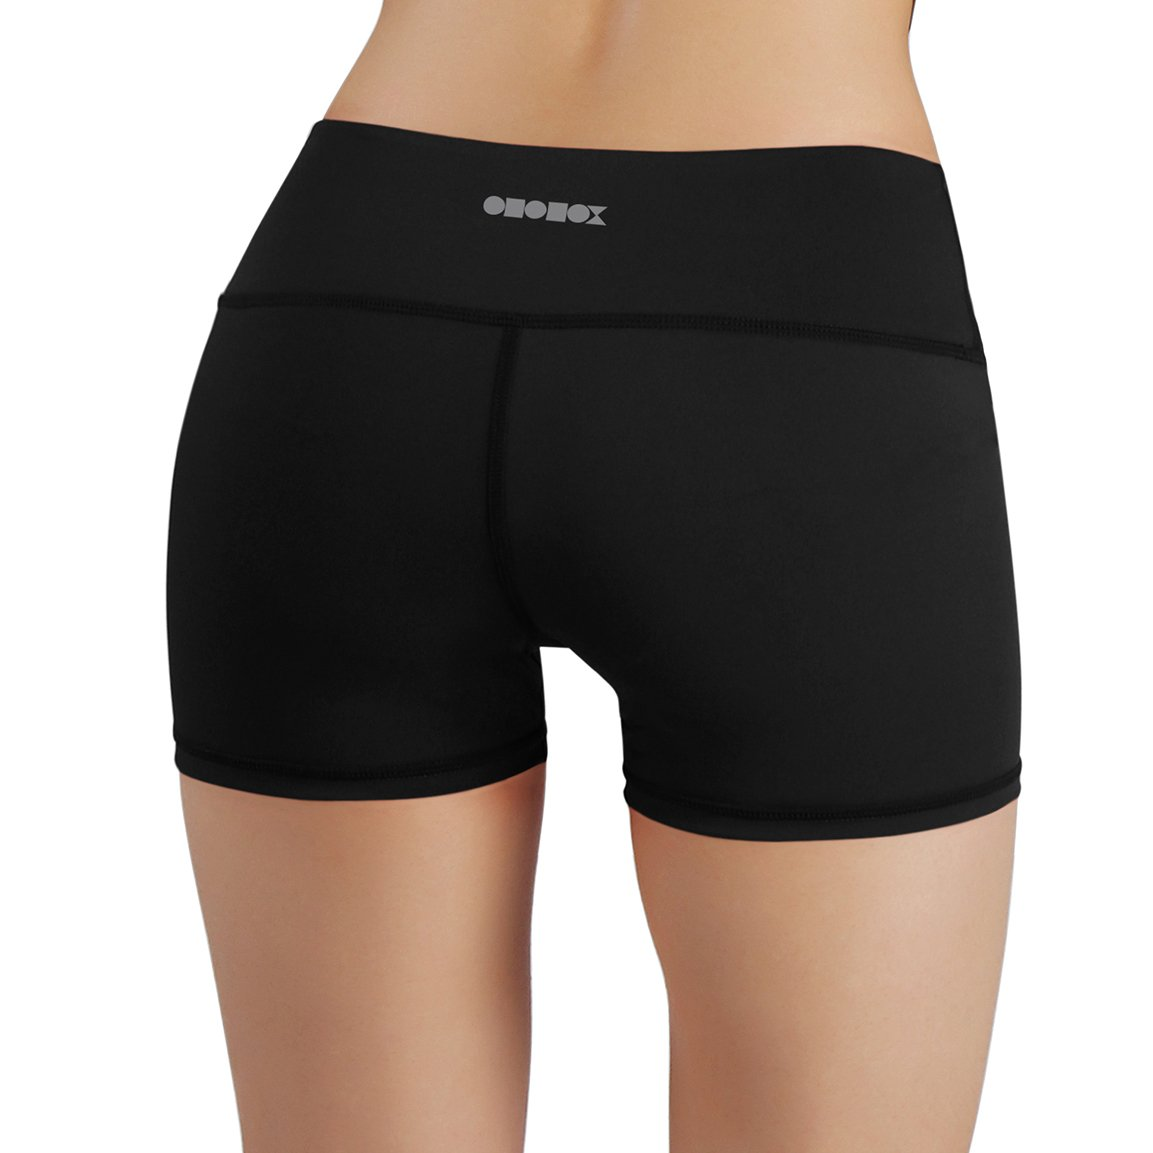 ODODOS Power Flex Yoga Shorts Women Tummy Control Workout